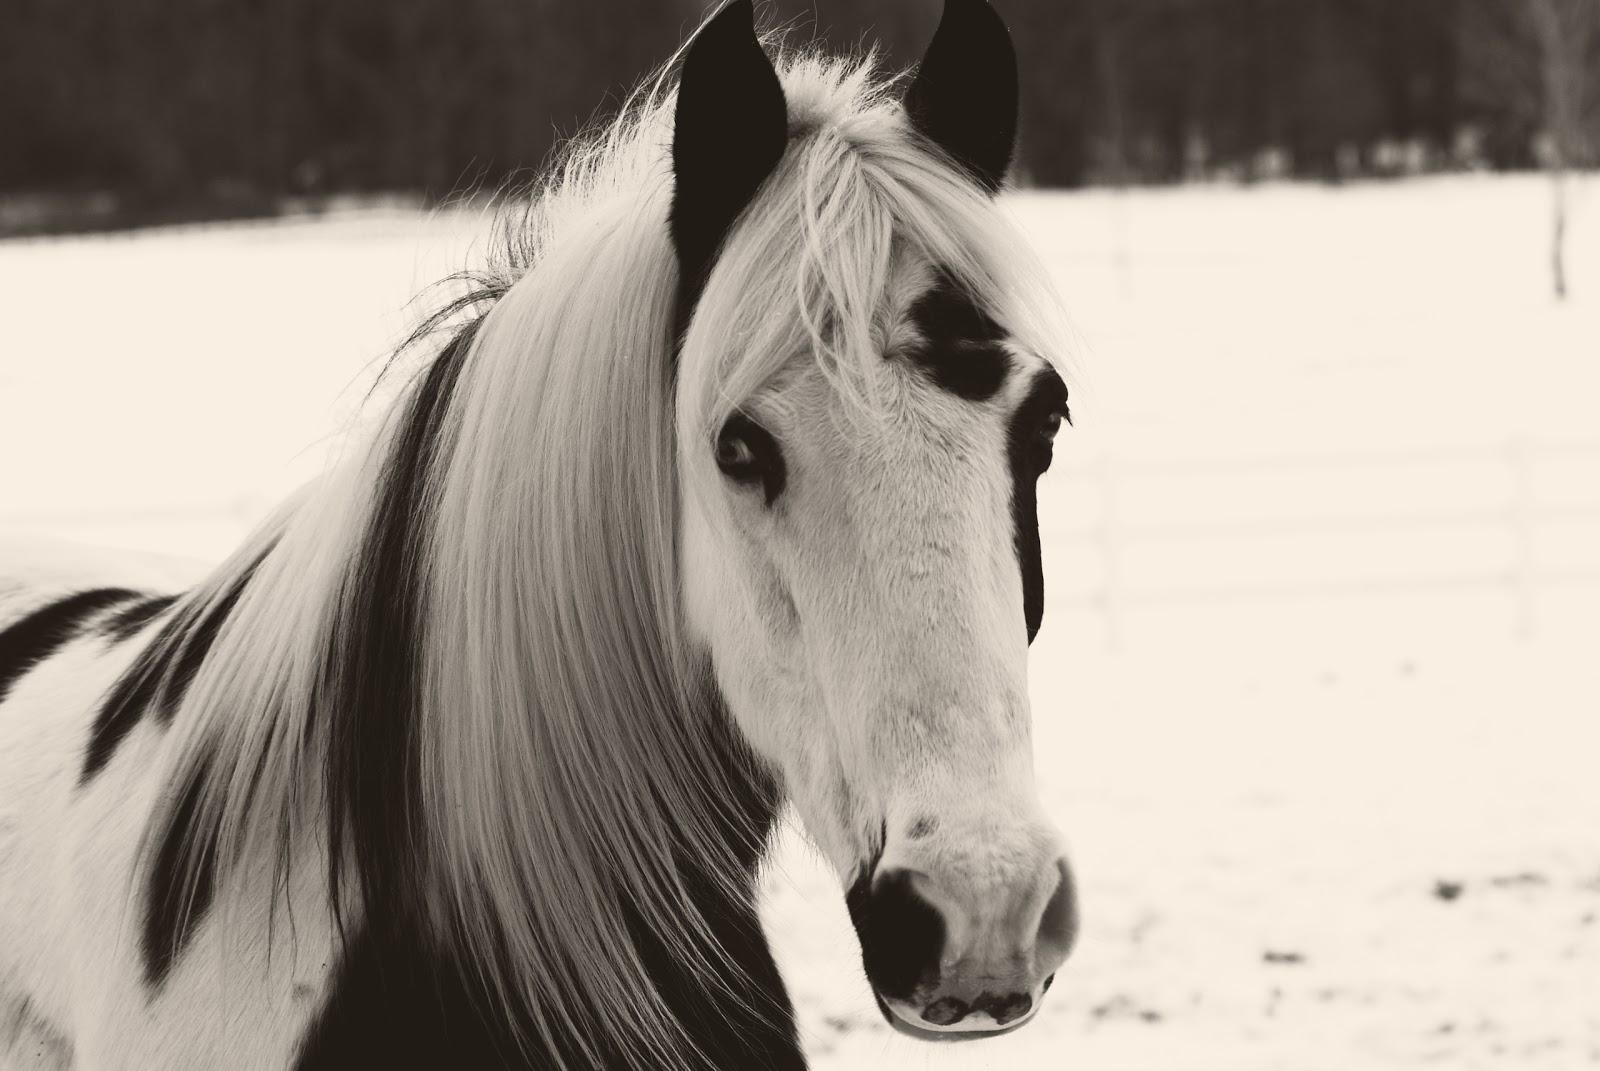 My Corner of the World: Black and White Pony